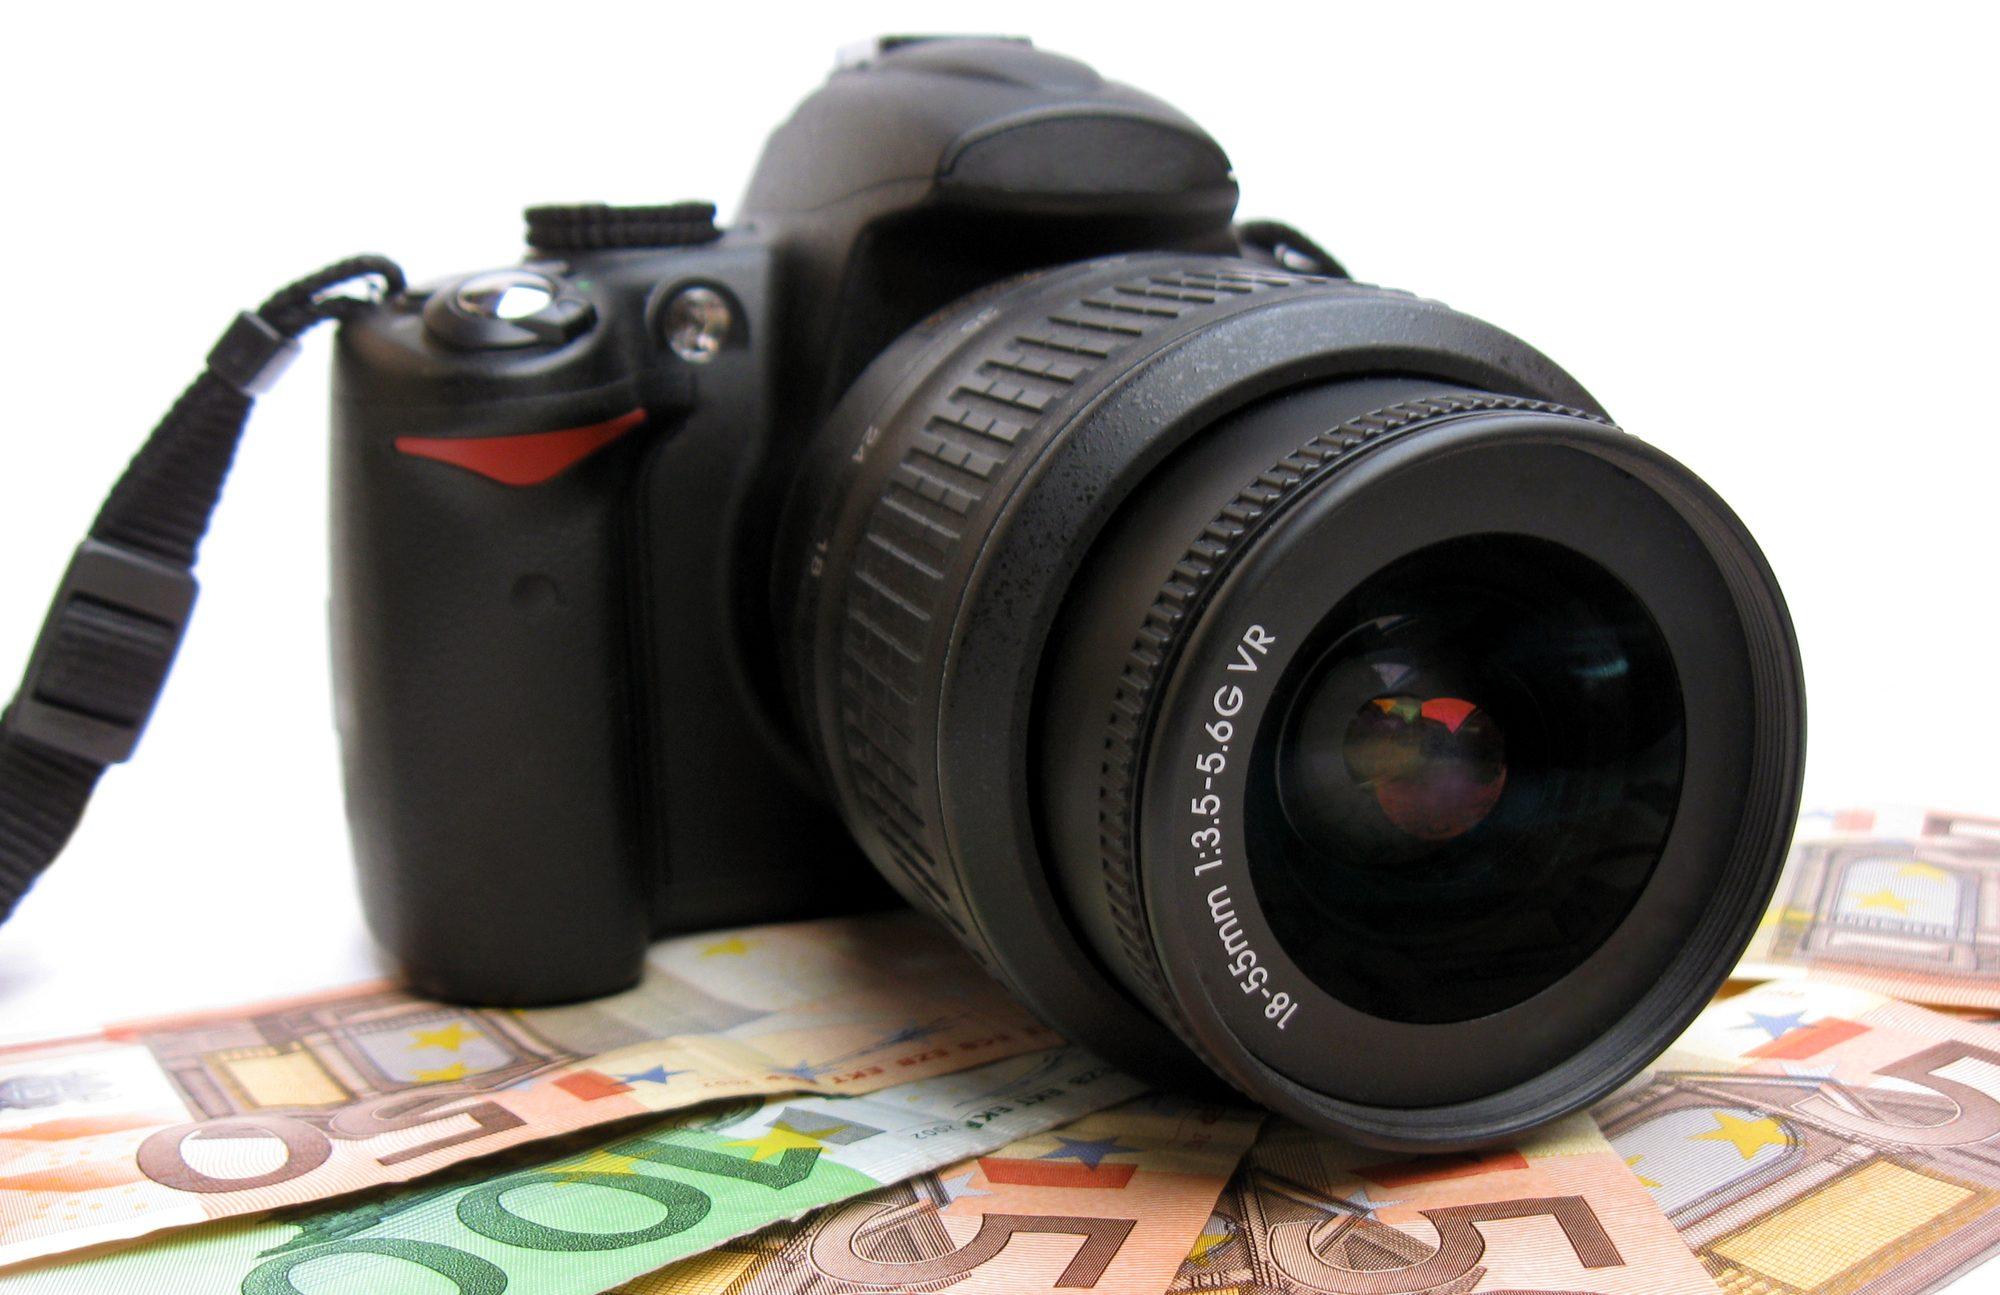 Hukum Meminjamkan Uang Guna Membeli Kamera untuk Bekerja? bimbingan islam